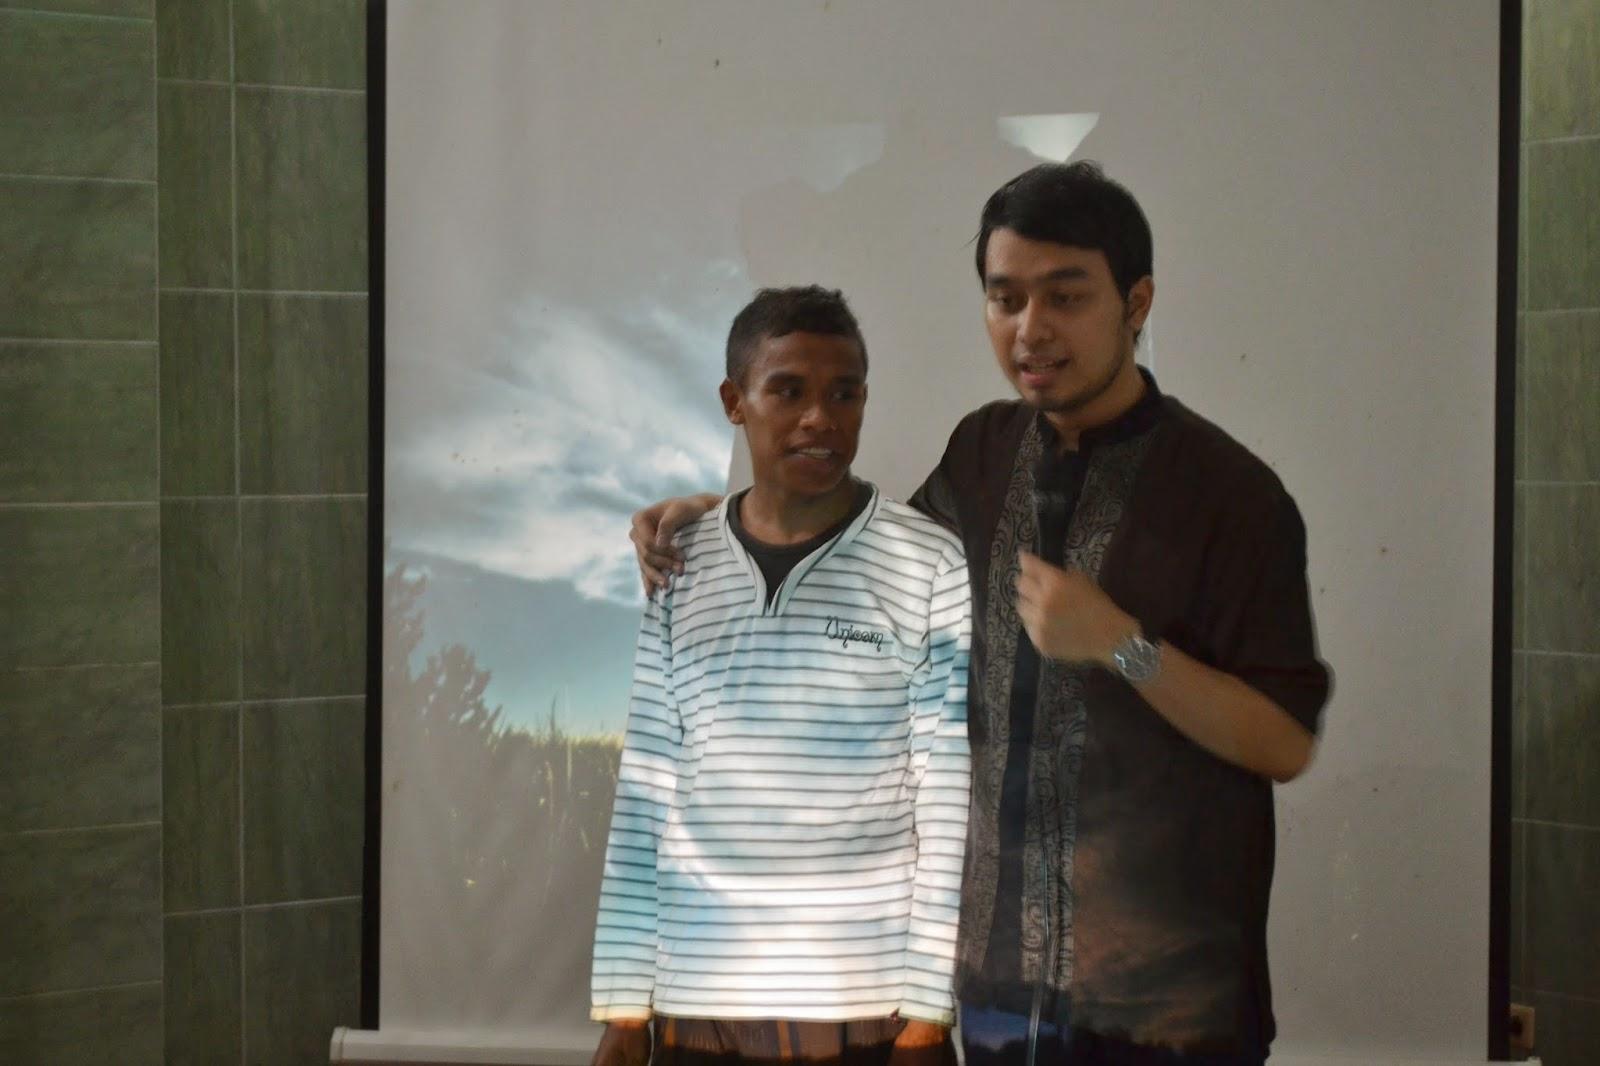 edvan m kautsar, motivator muda, motivator indonesia, pembicara nasional, motivator nasional, motivator sekolah, motivator kampus, motivator termuda